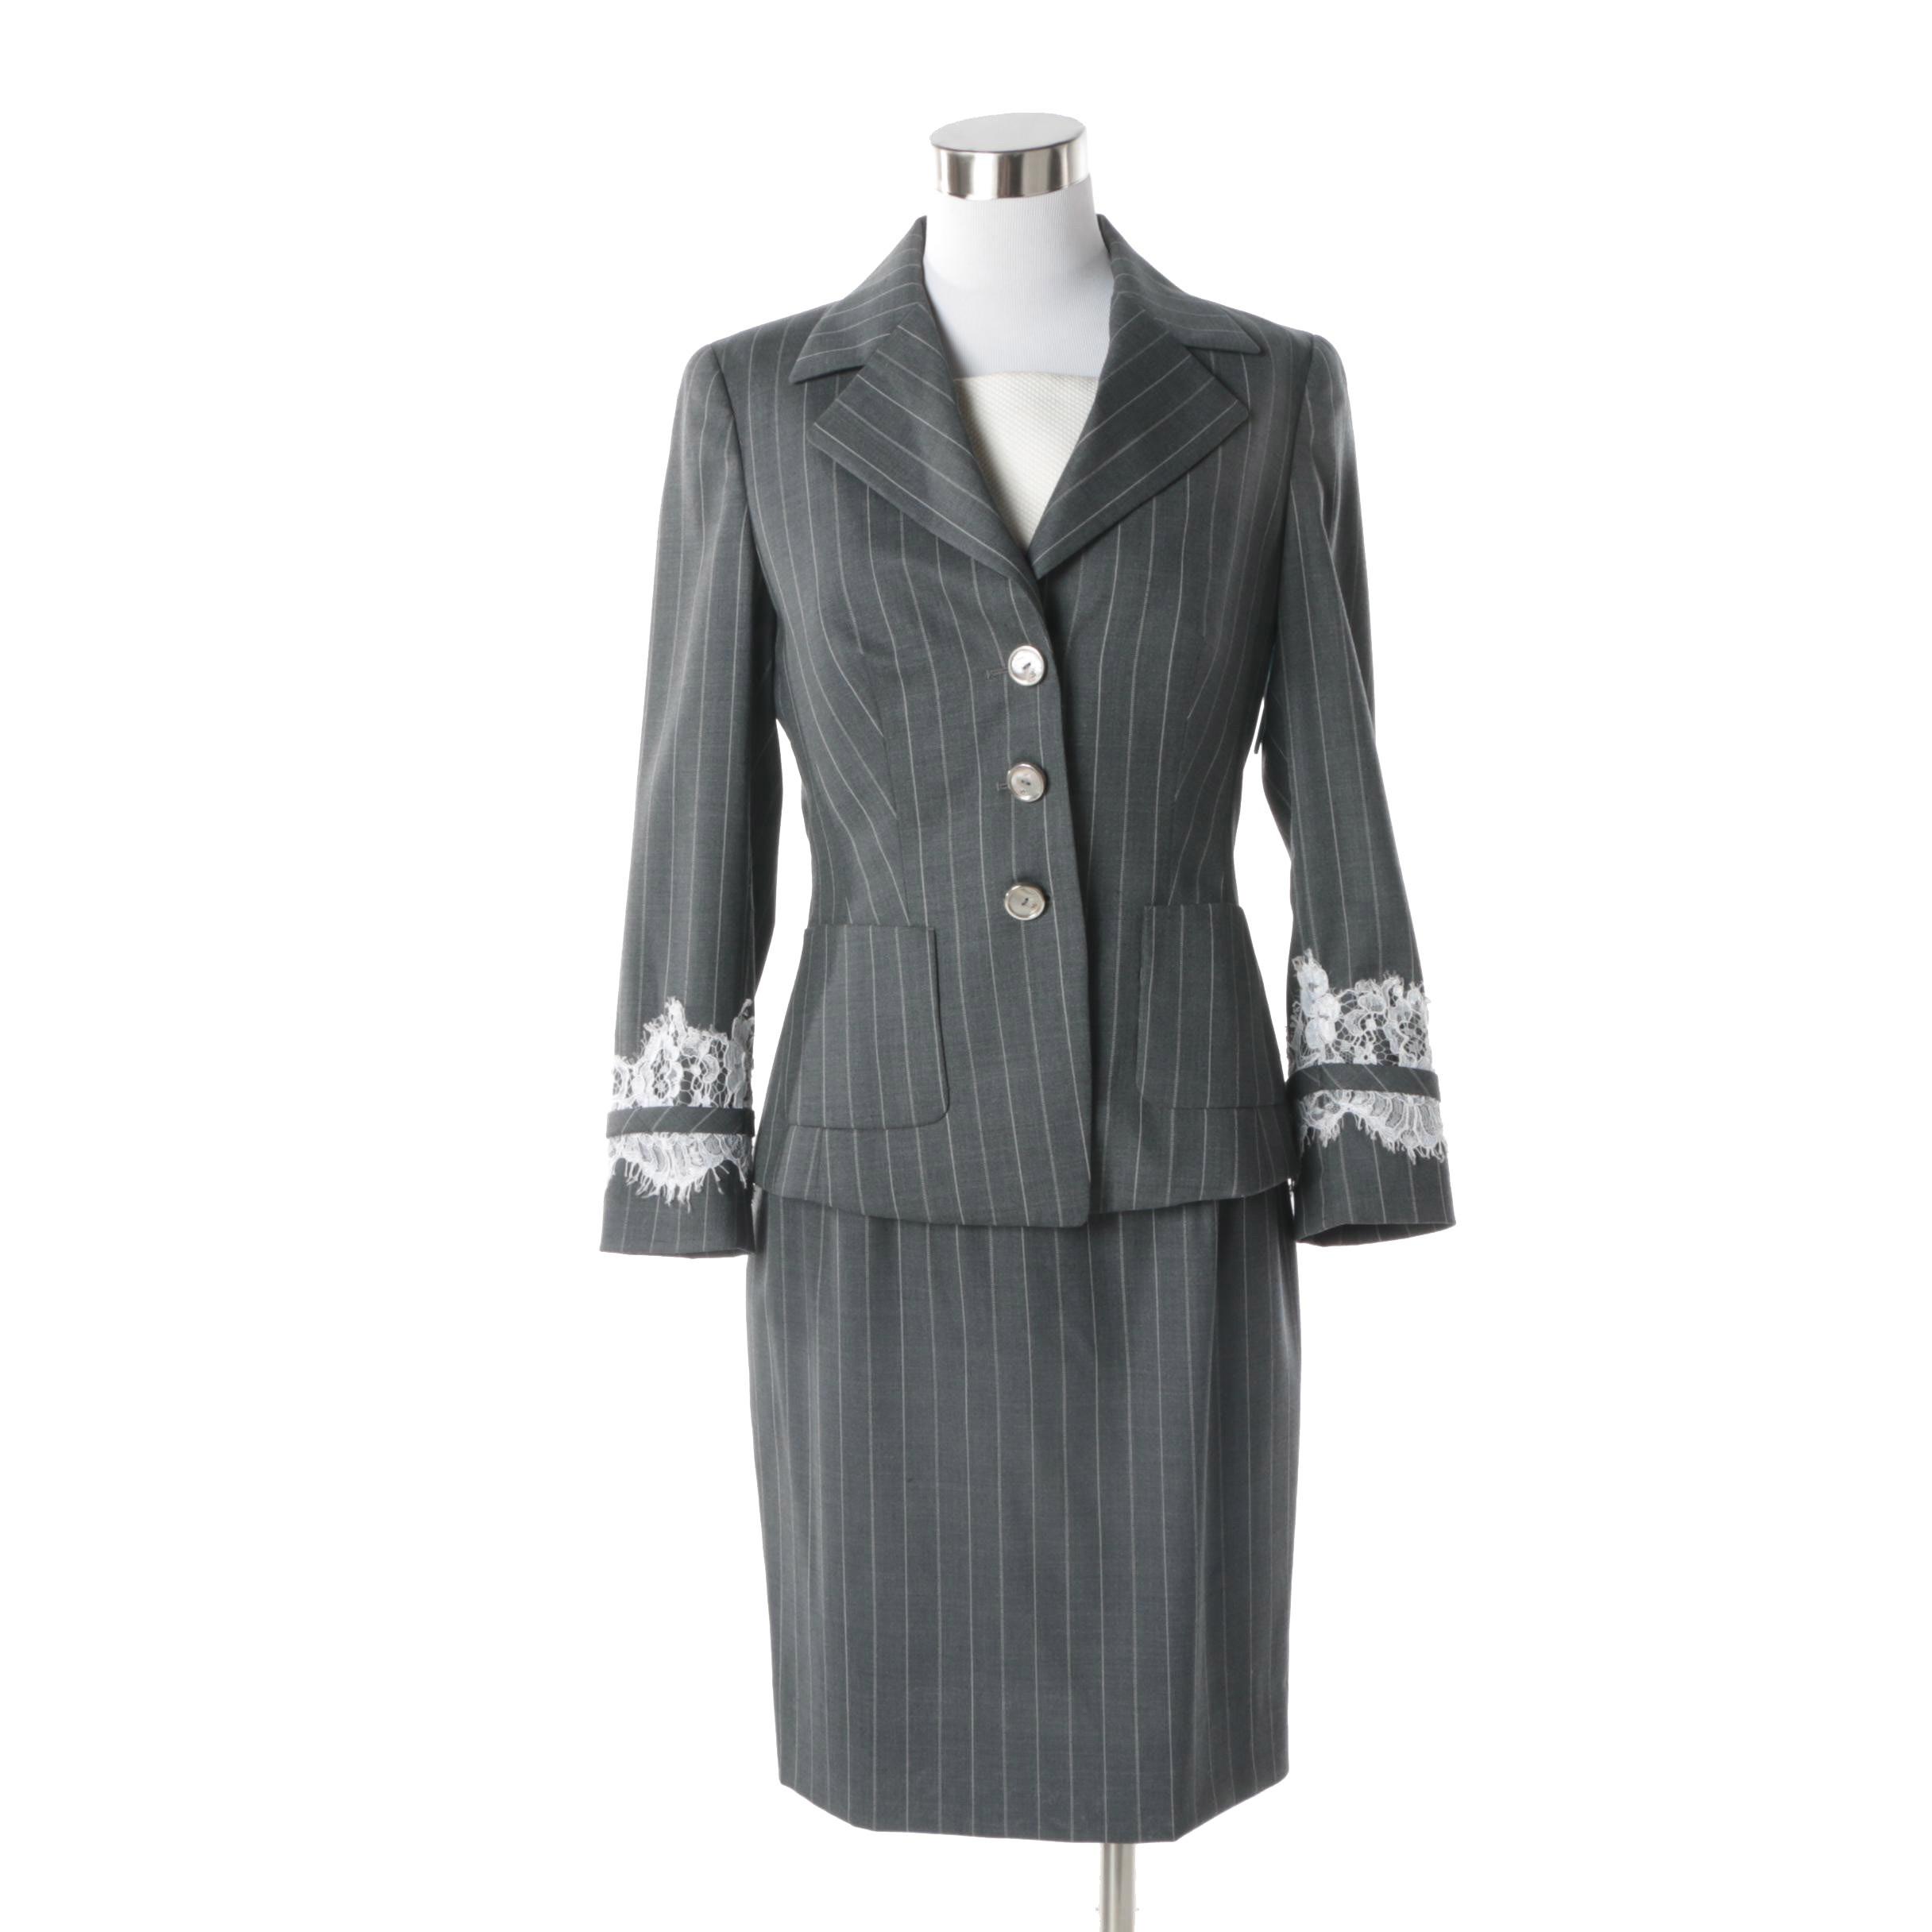 Women's Vintage Escada Grey Wool Pinstripe Dress Suit with Lace Trim